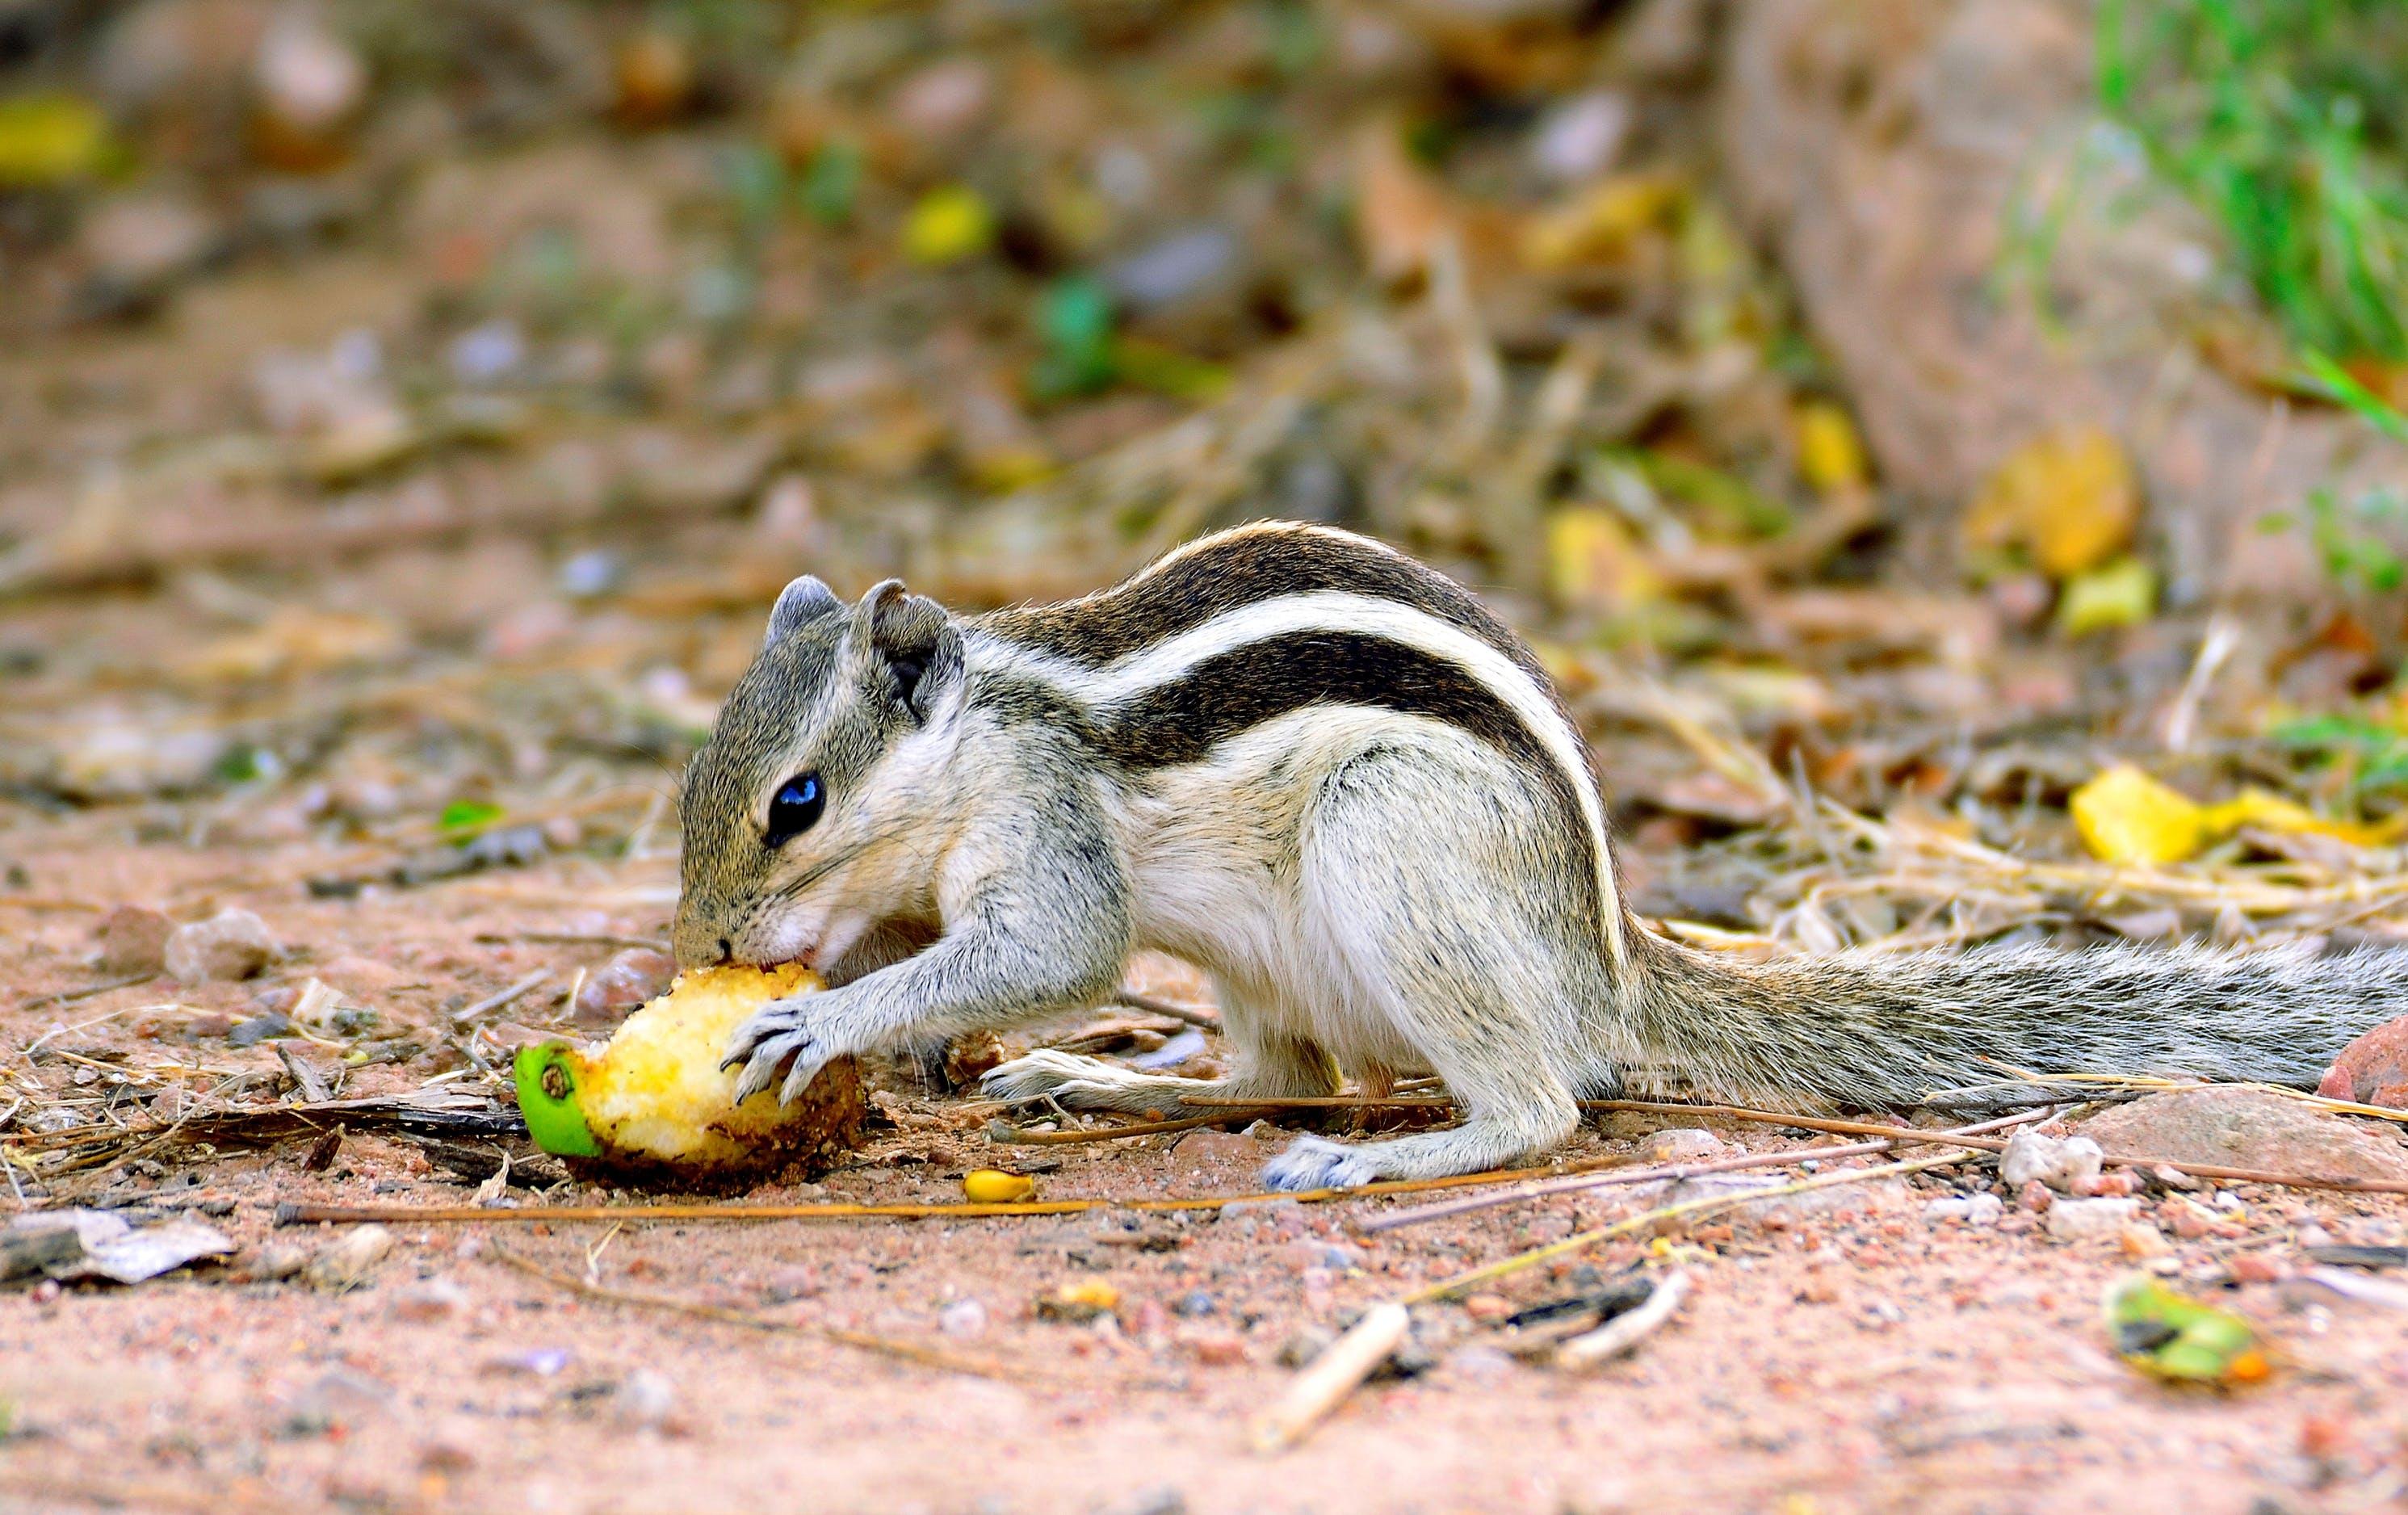 Free stock photo of #nature#wildlife#animals#jungle